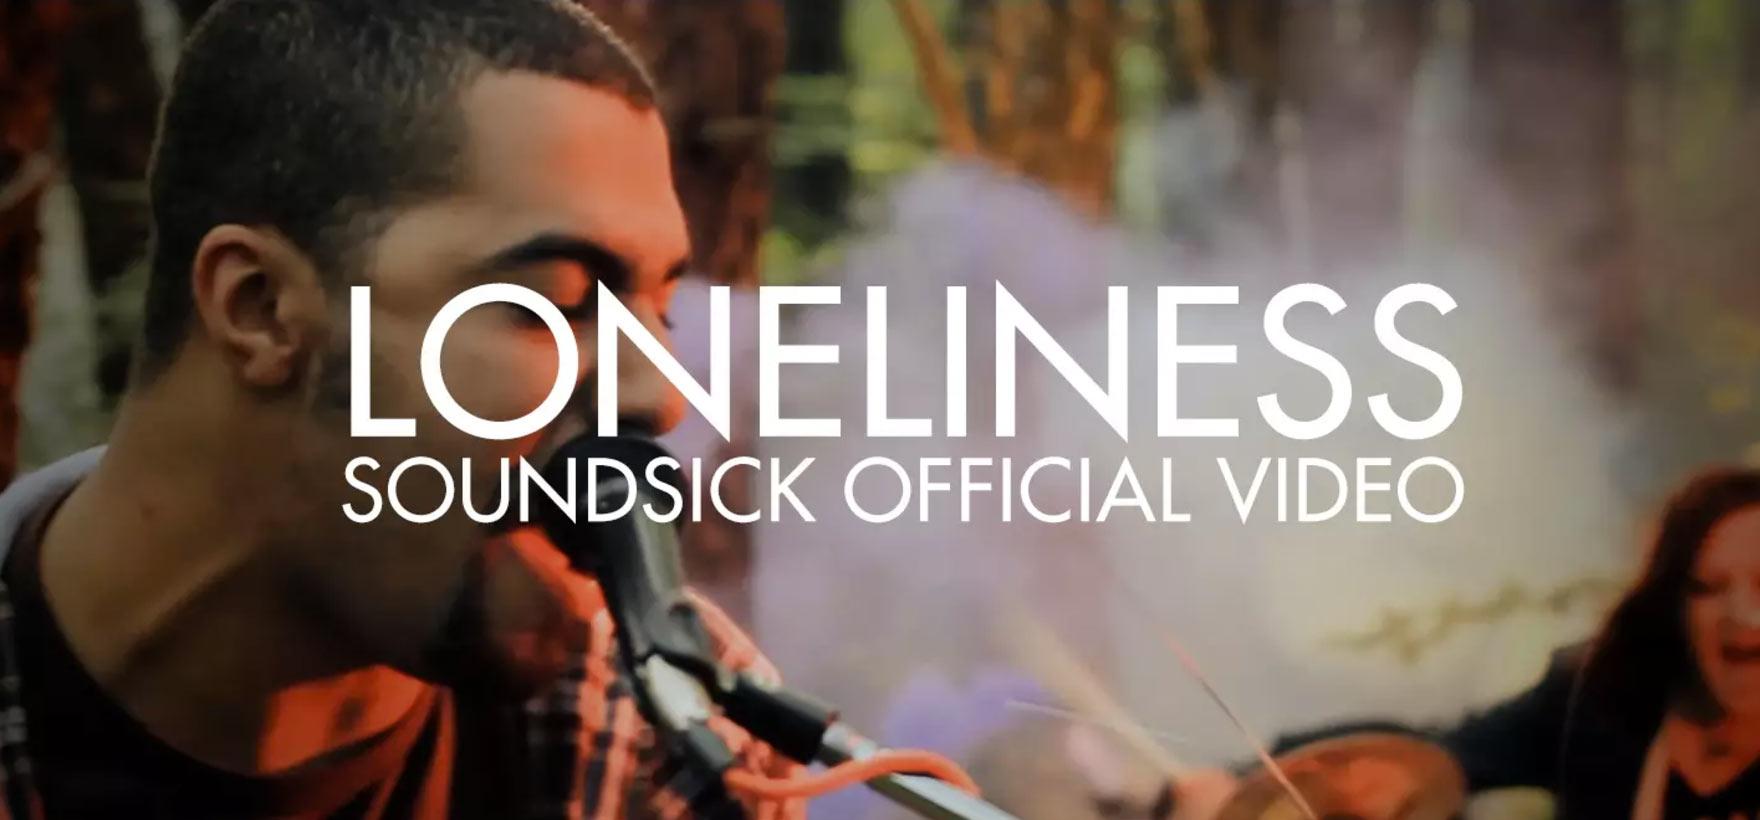 Loneliness - Soundsick